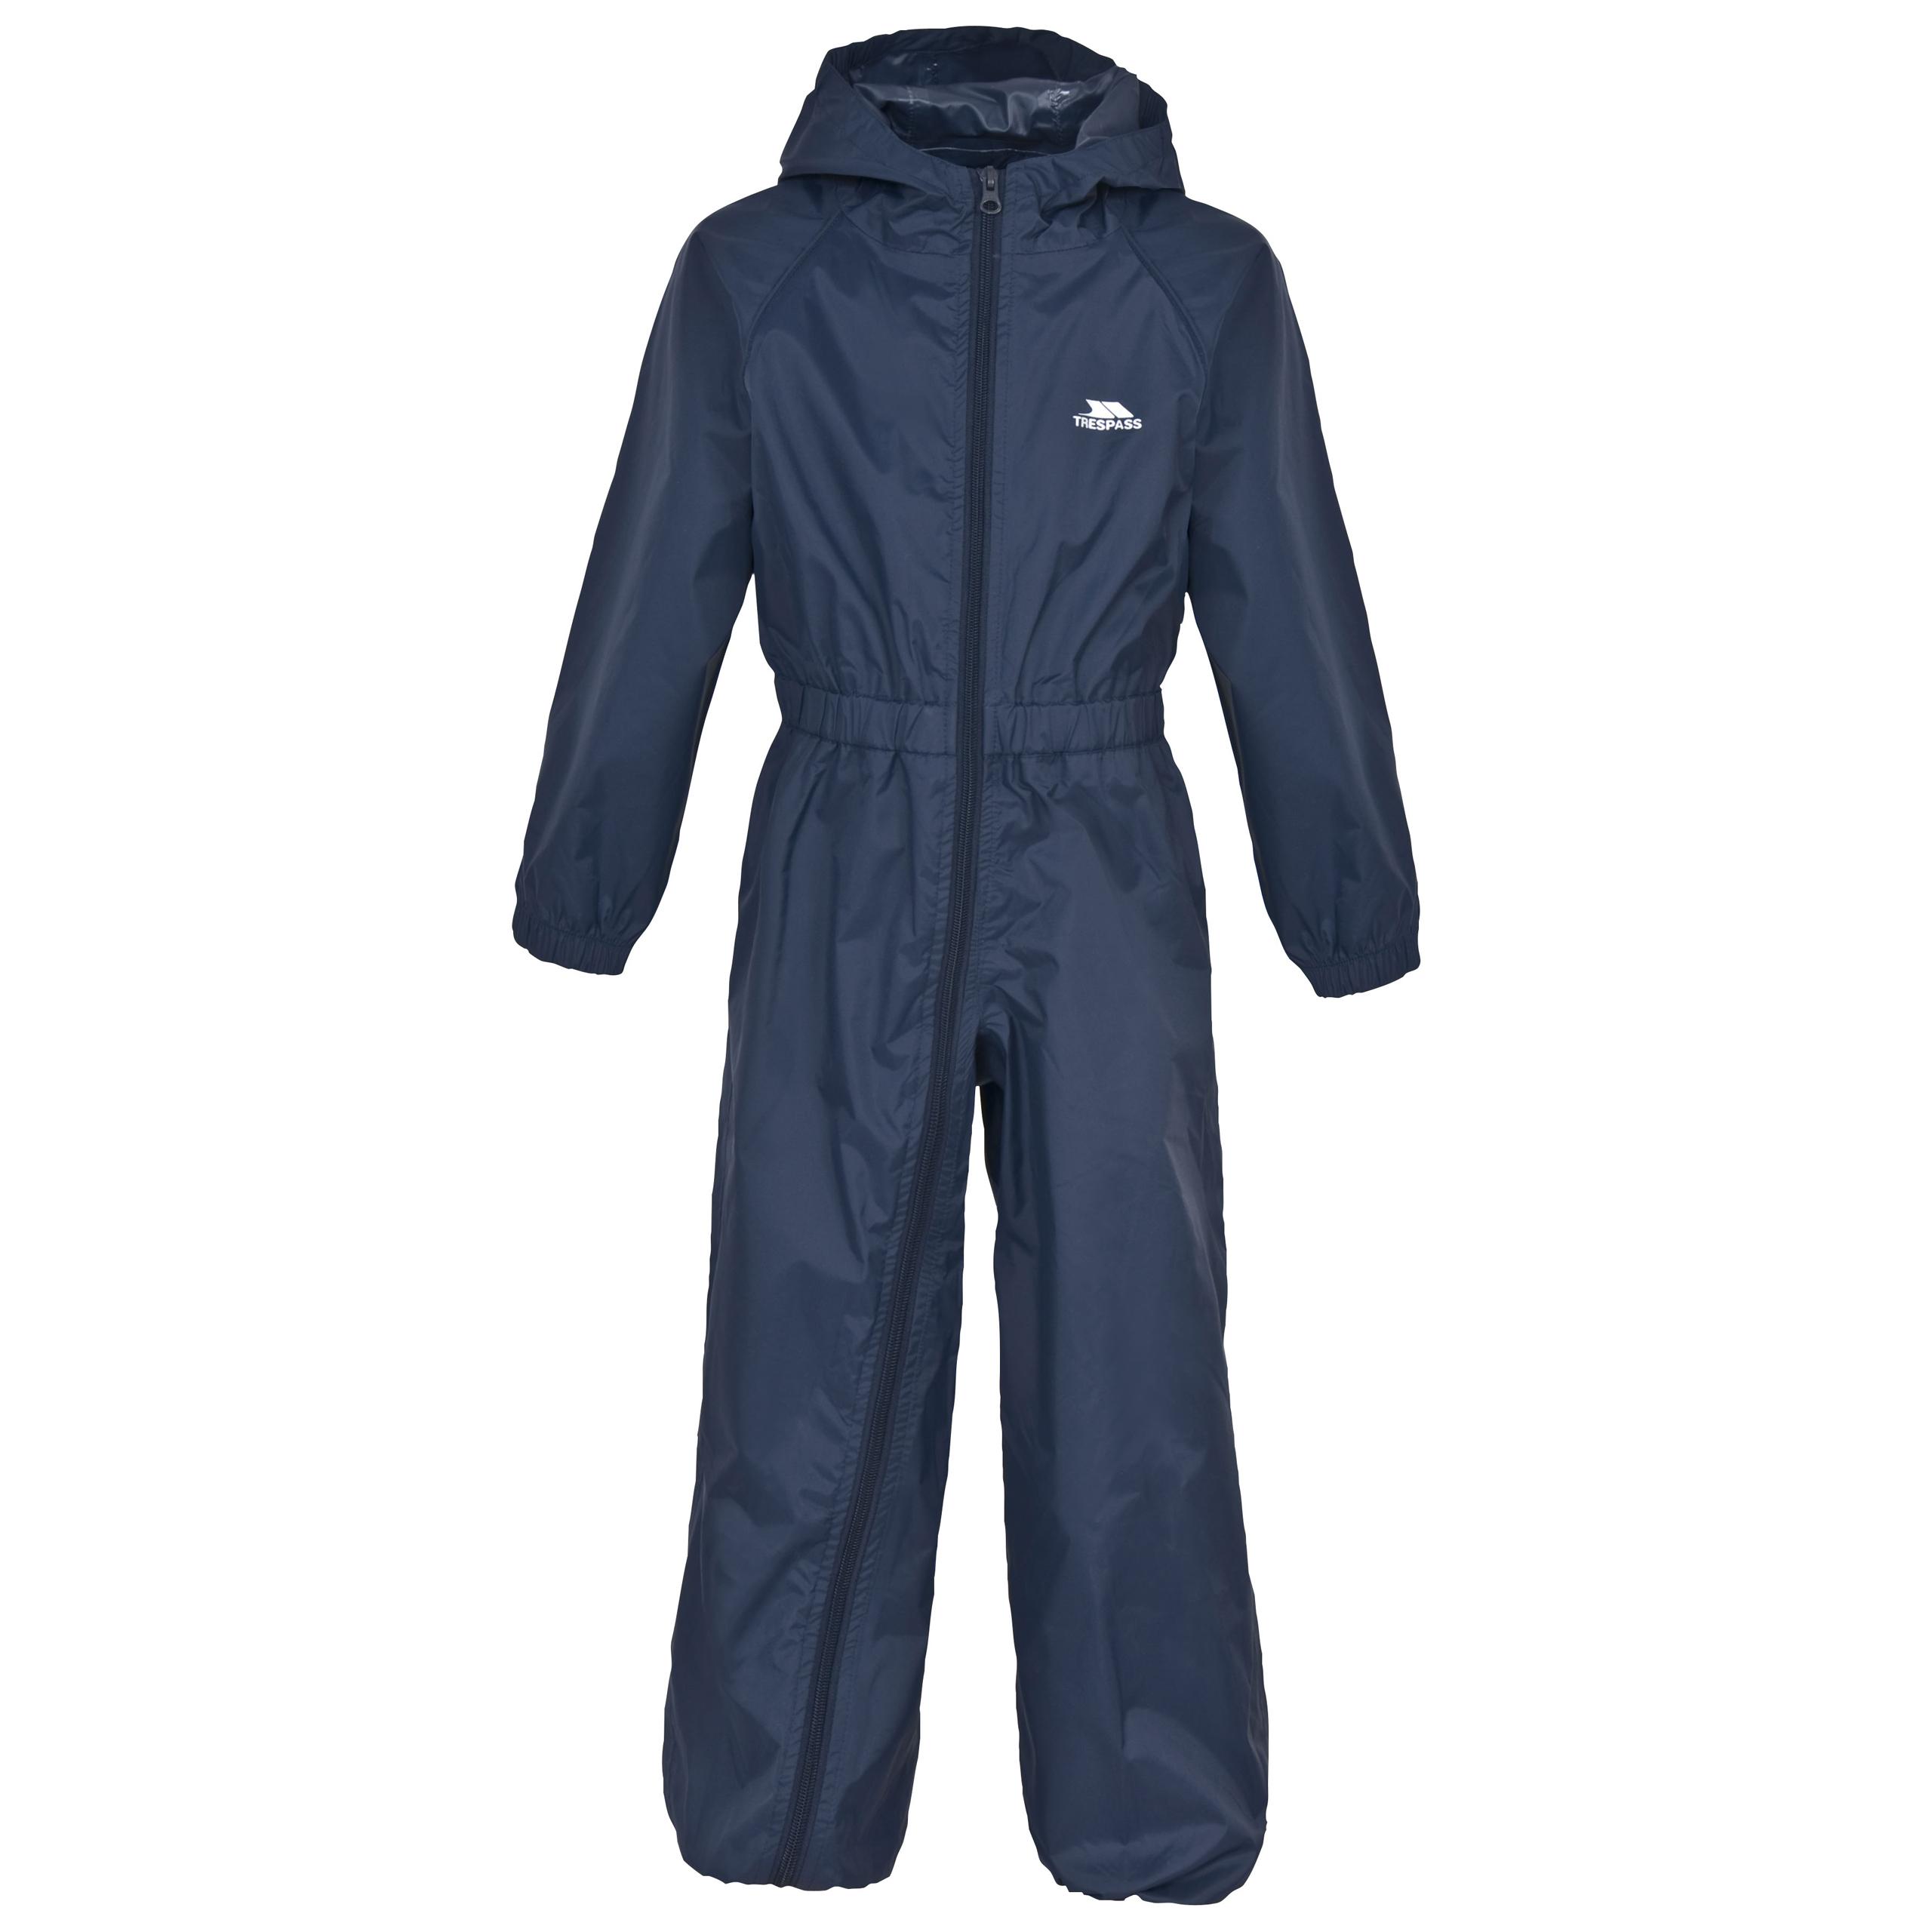 Trespass-Button-Kids-Waterproof-Rain-Suit-Boys-Girls-Windproof-All-In-One-Jacket thumbnail 16